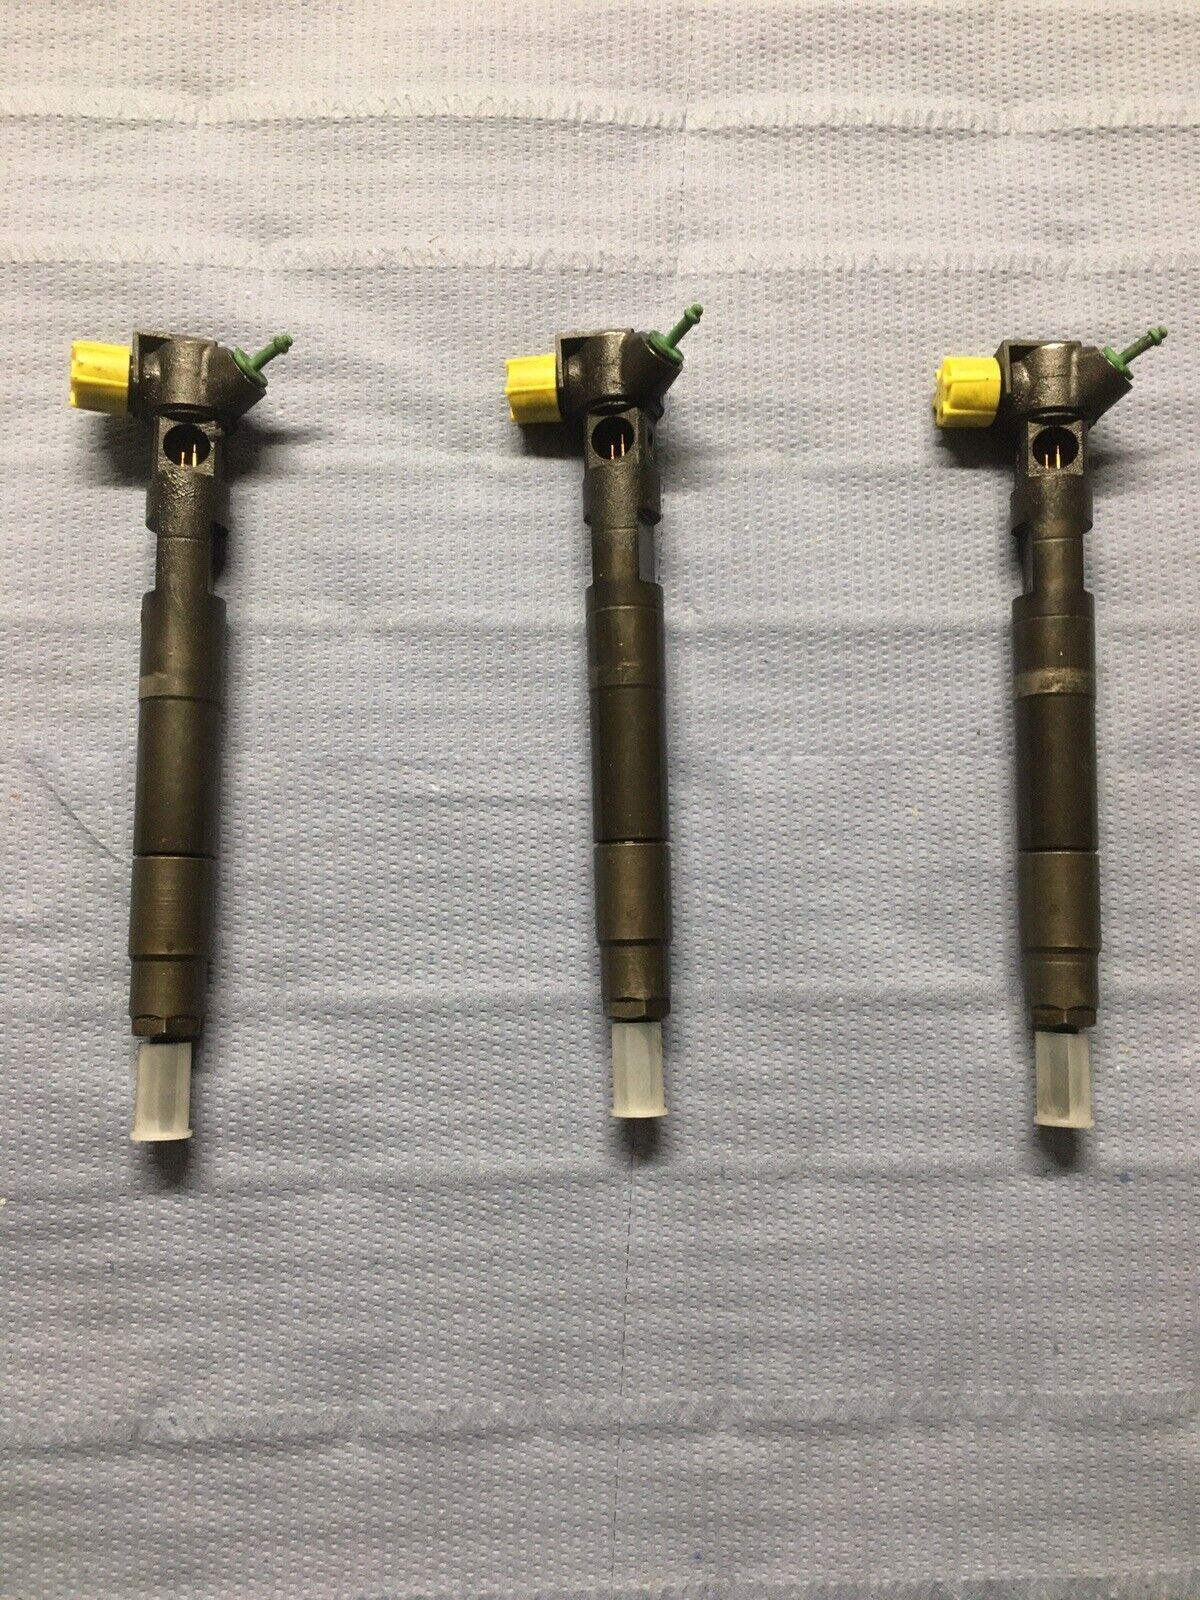 Einspritzdüse Injektor Injector Mercedes Sprinter 215 315 415 CDI A6460701287